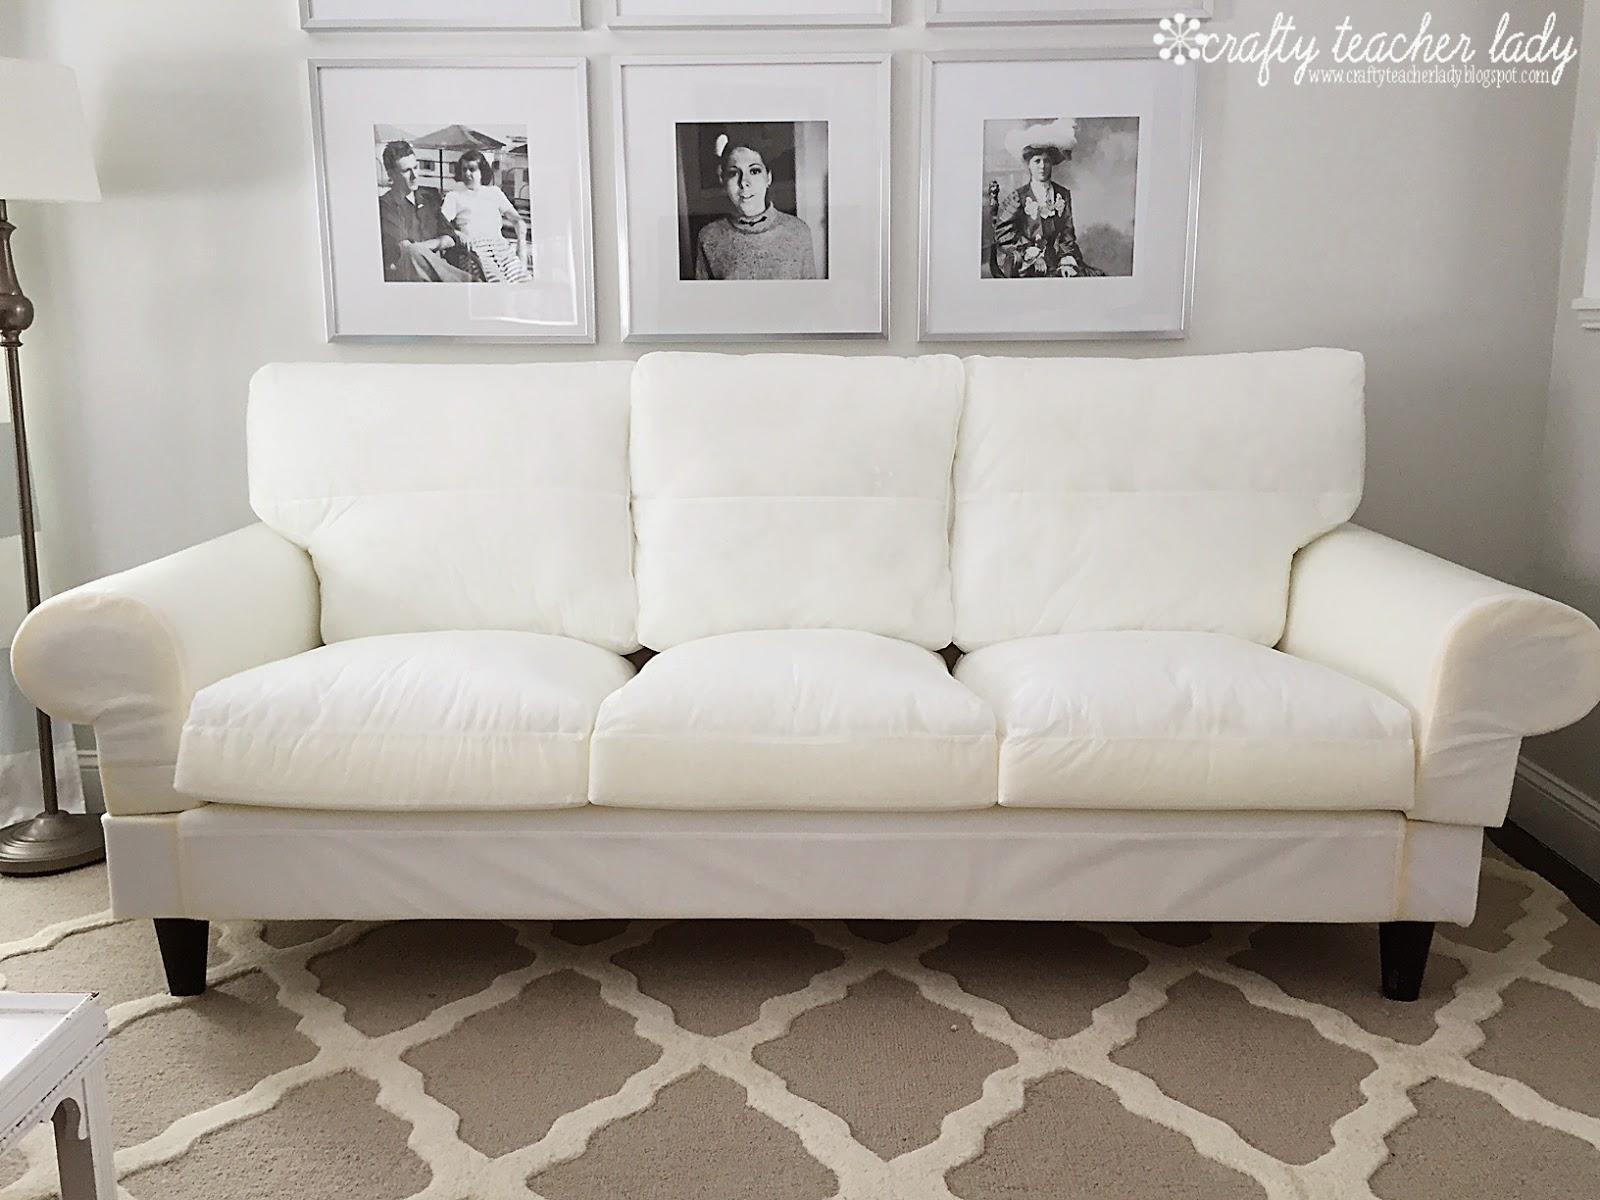 review of the ikea ektorp sofa series XNMLPAT